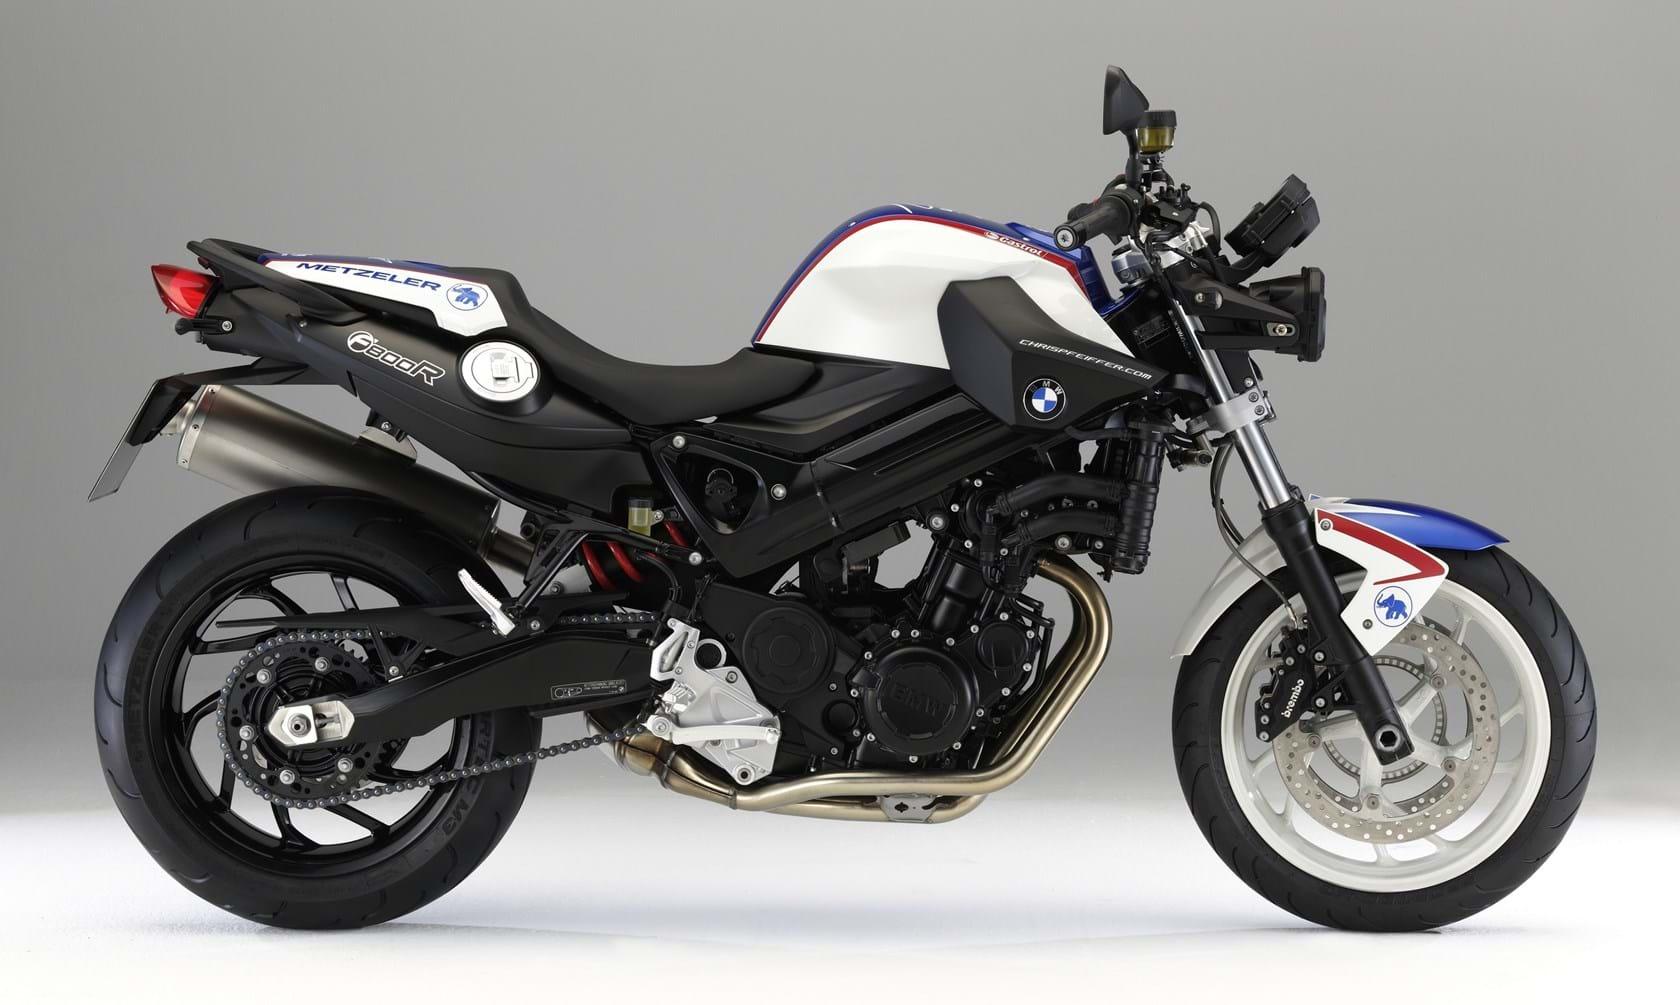 For Sale Bmw F800r The Bike Market